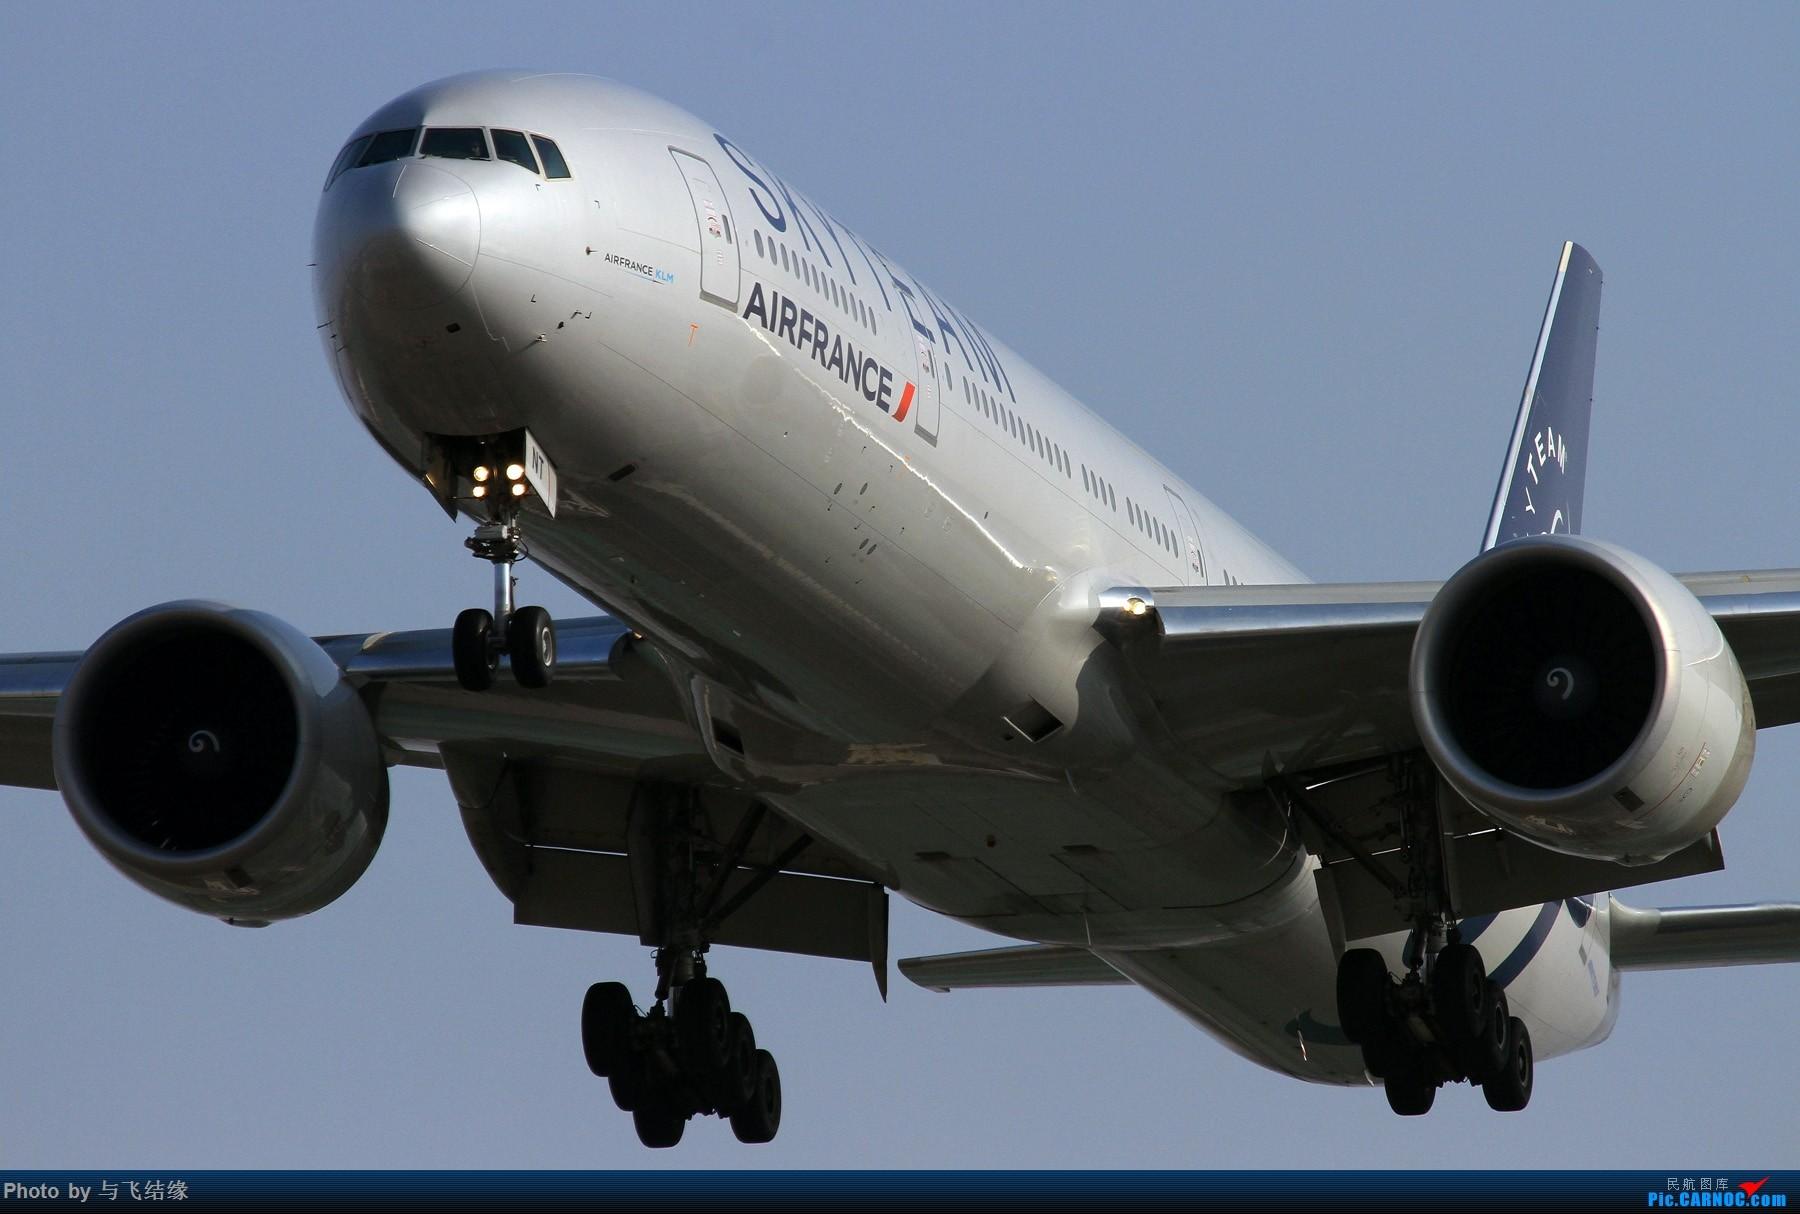 Re:法国航空公司天合联盟涂装Boeing 777-300ER。 BOEING 777-300ER F-QZNT 中国北京首都国际机场